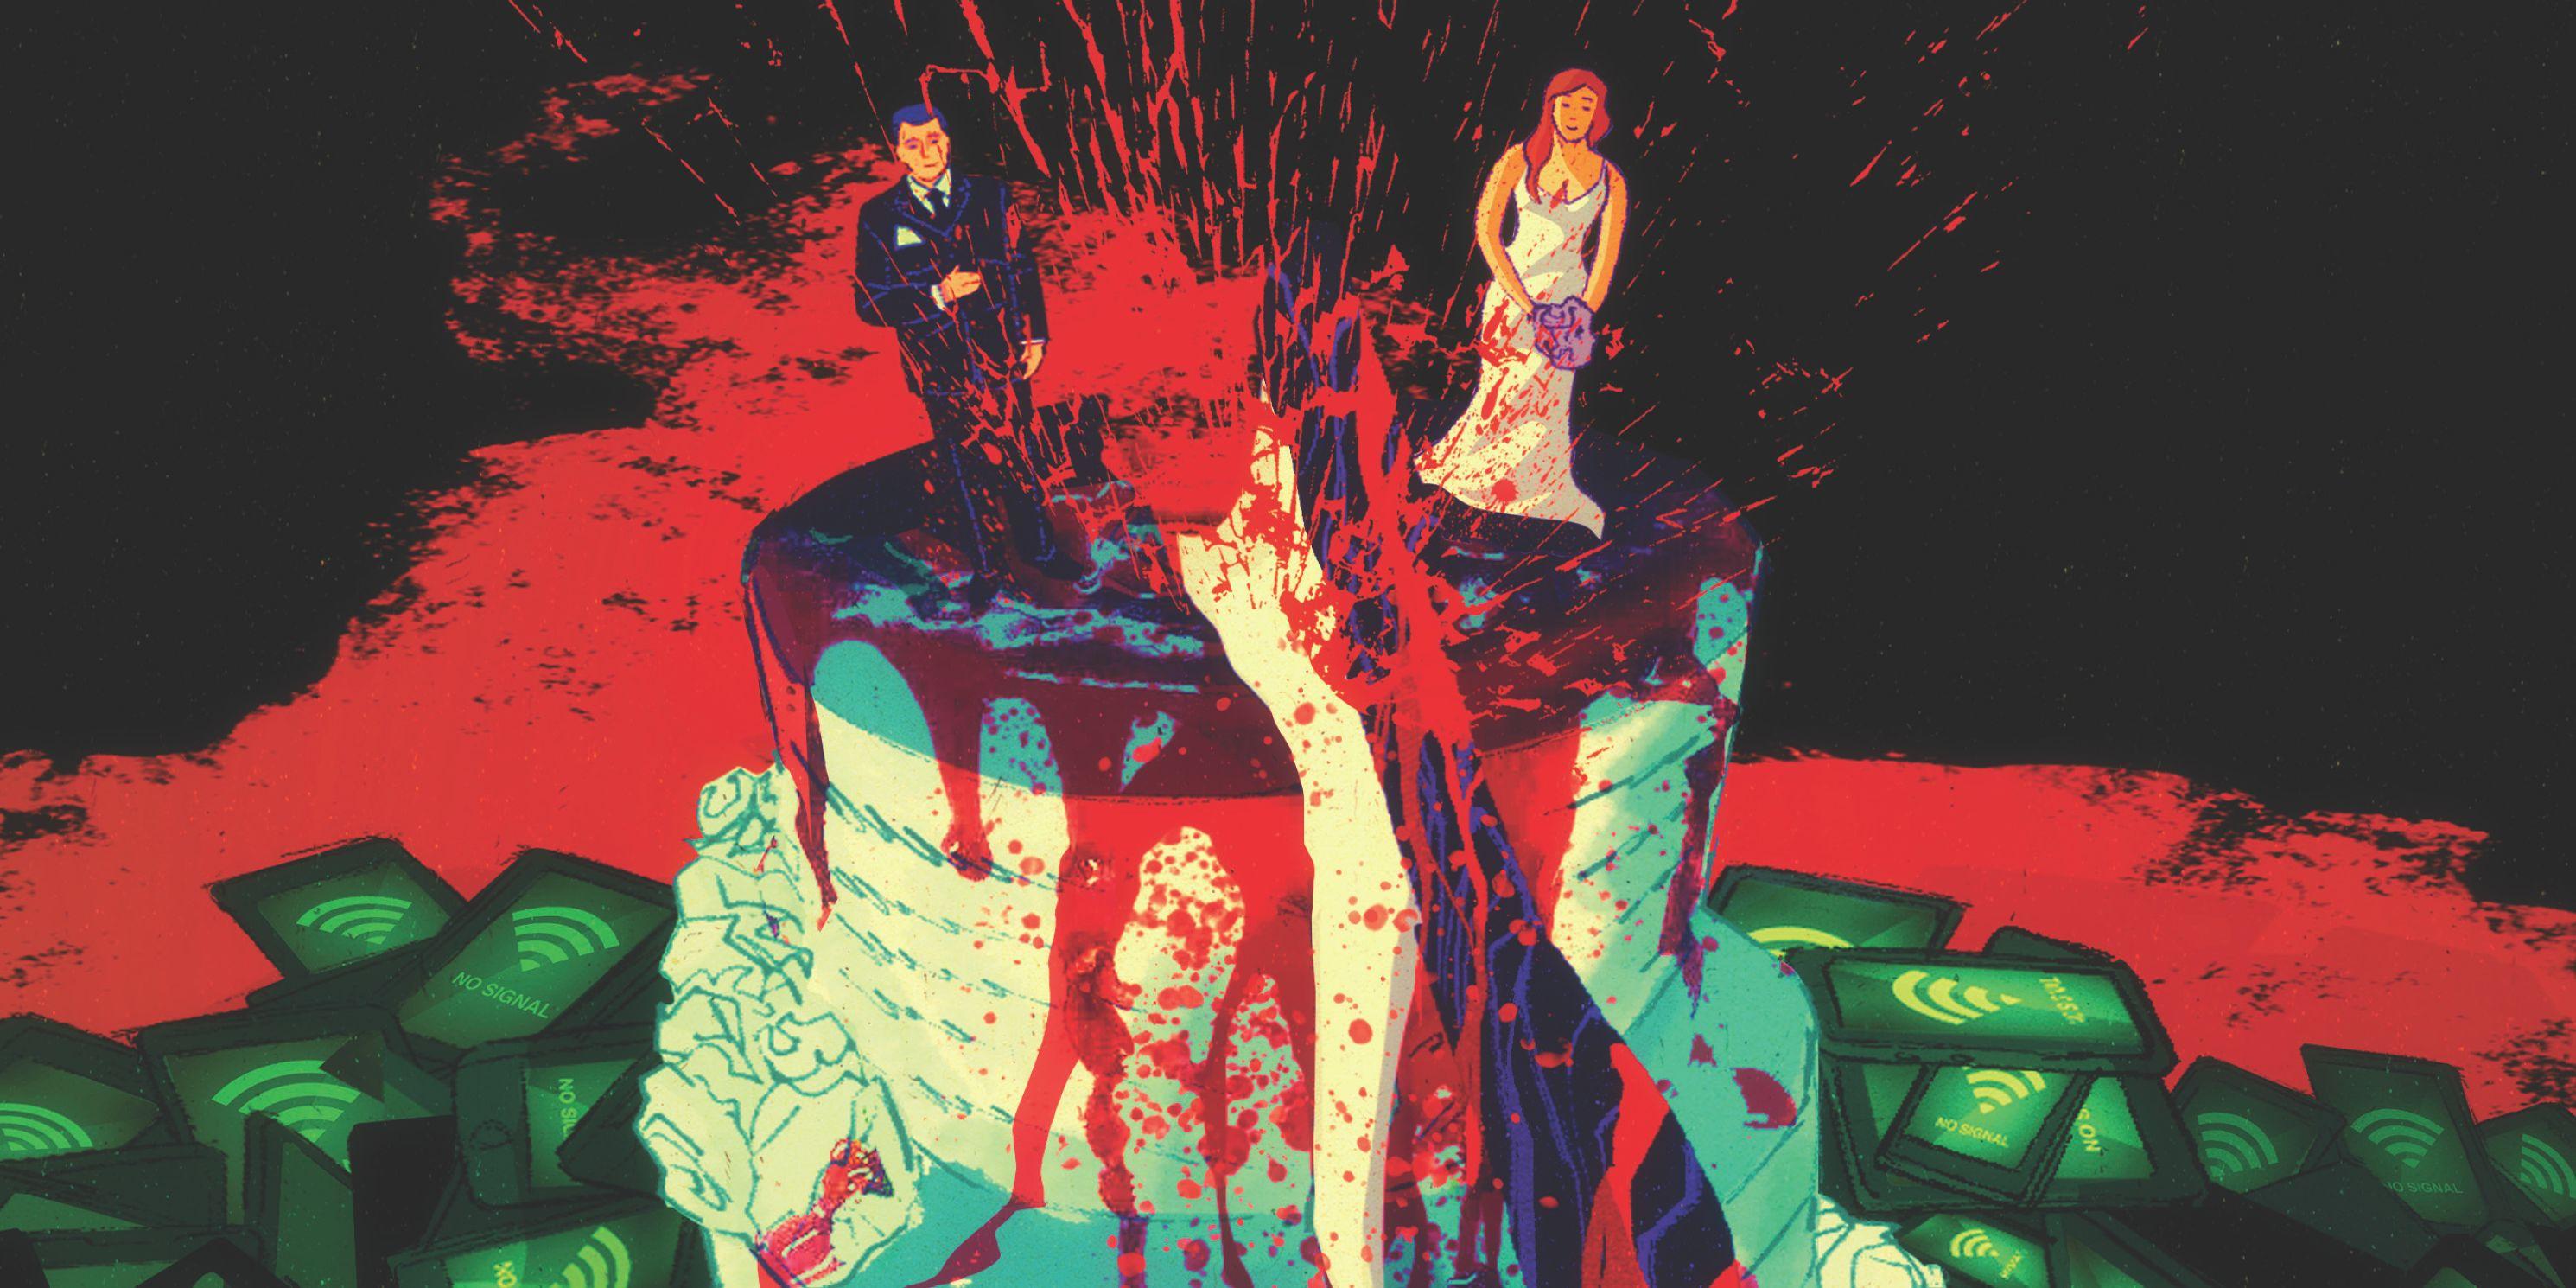 2943b8263bc AfterShock Comics Announces Bad Reception From Juan Doe